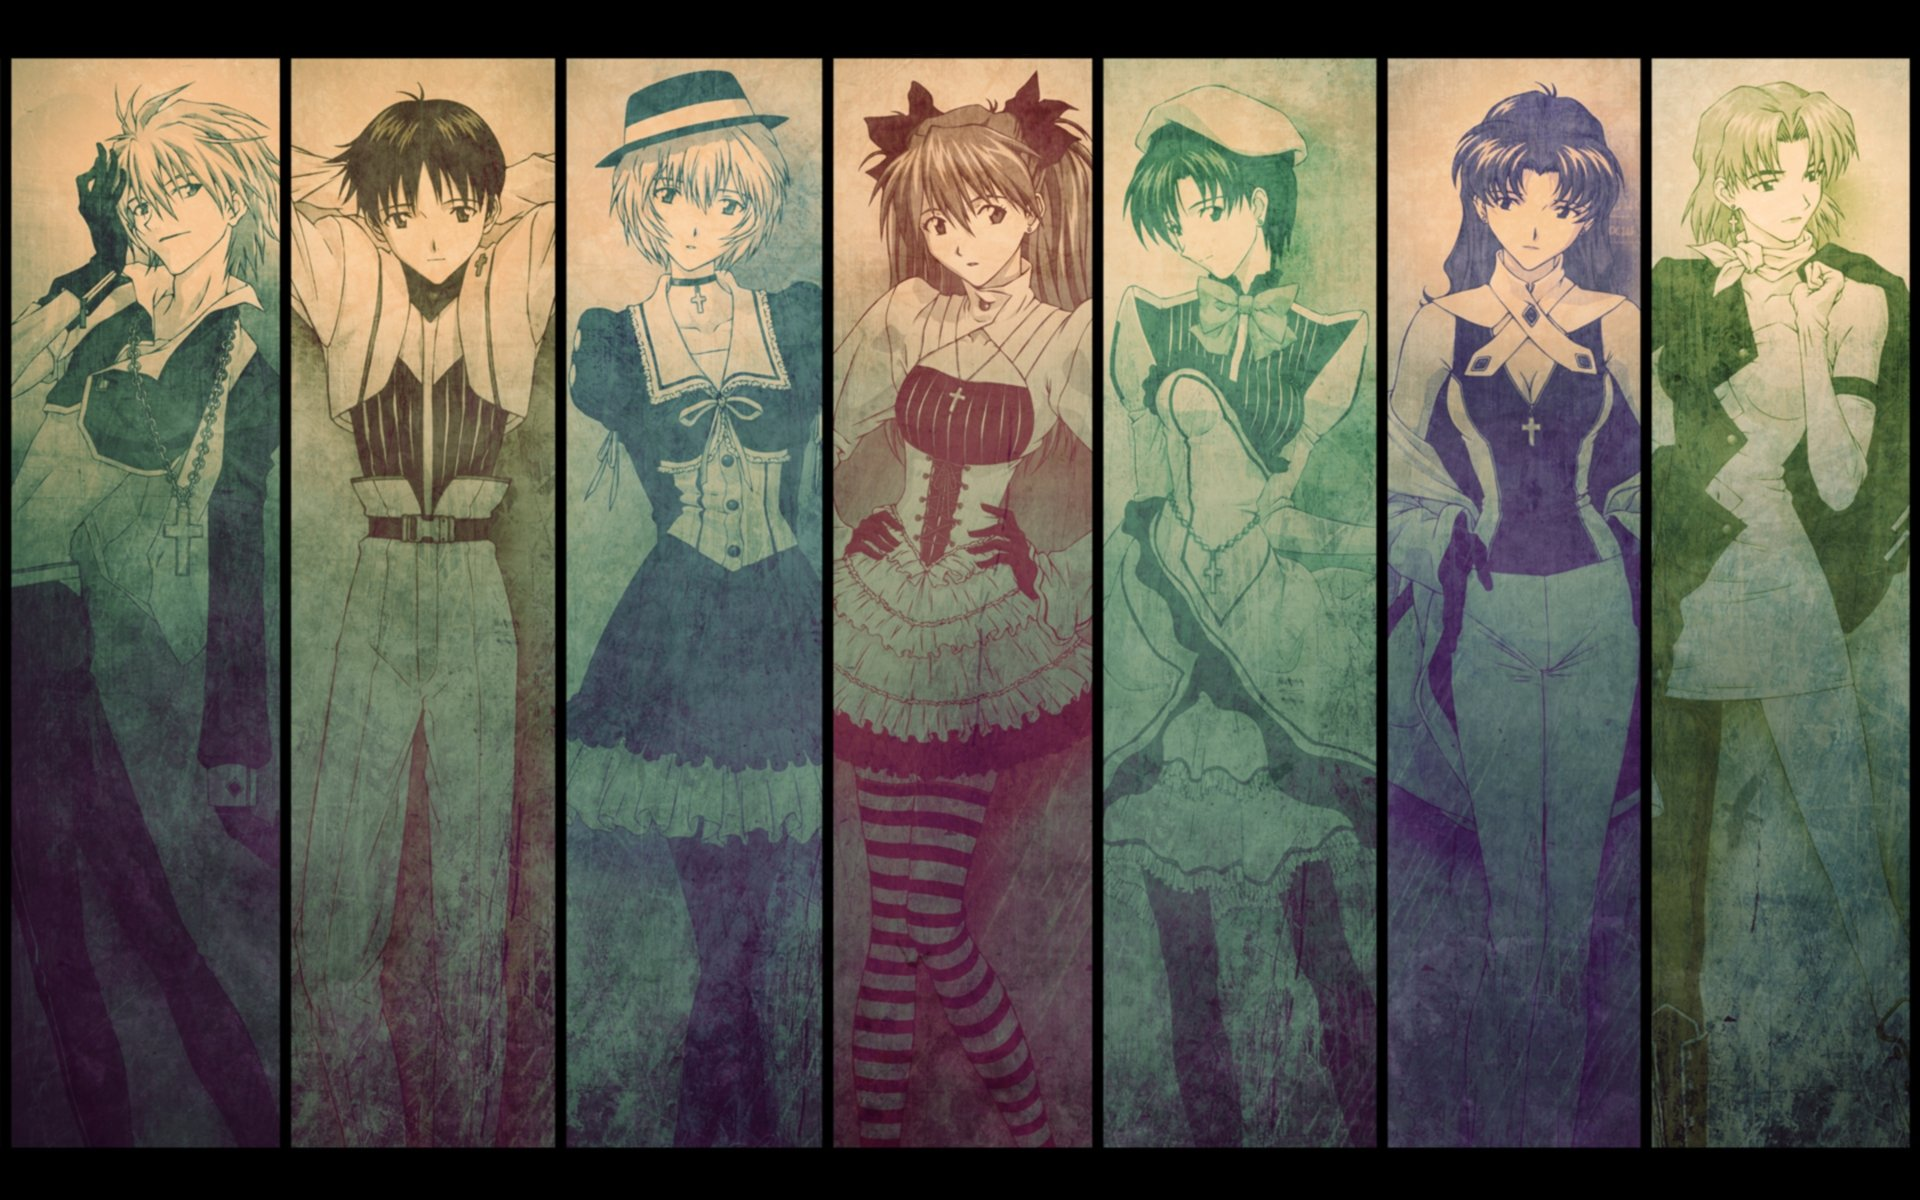 Anime Google Skins Vintage Anime Google Backgrounds Vintage Anime 1920x1200